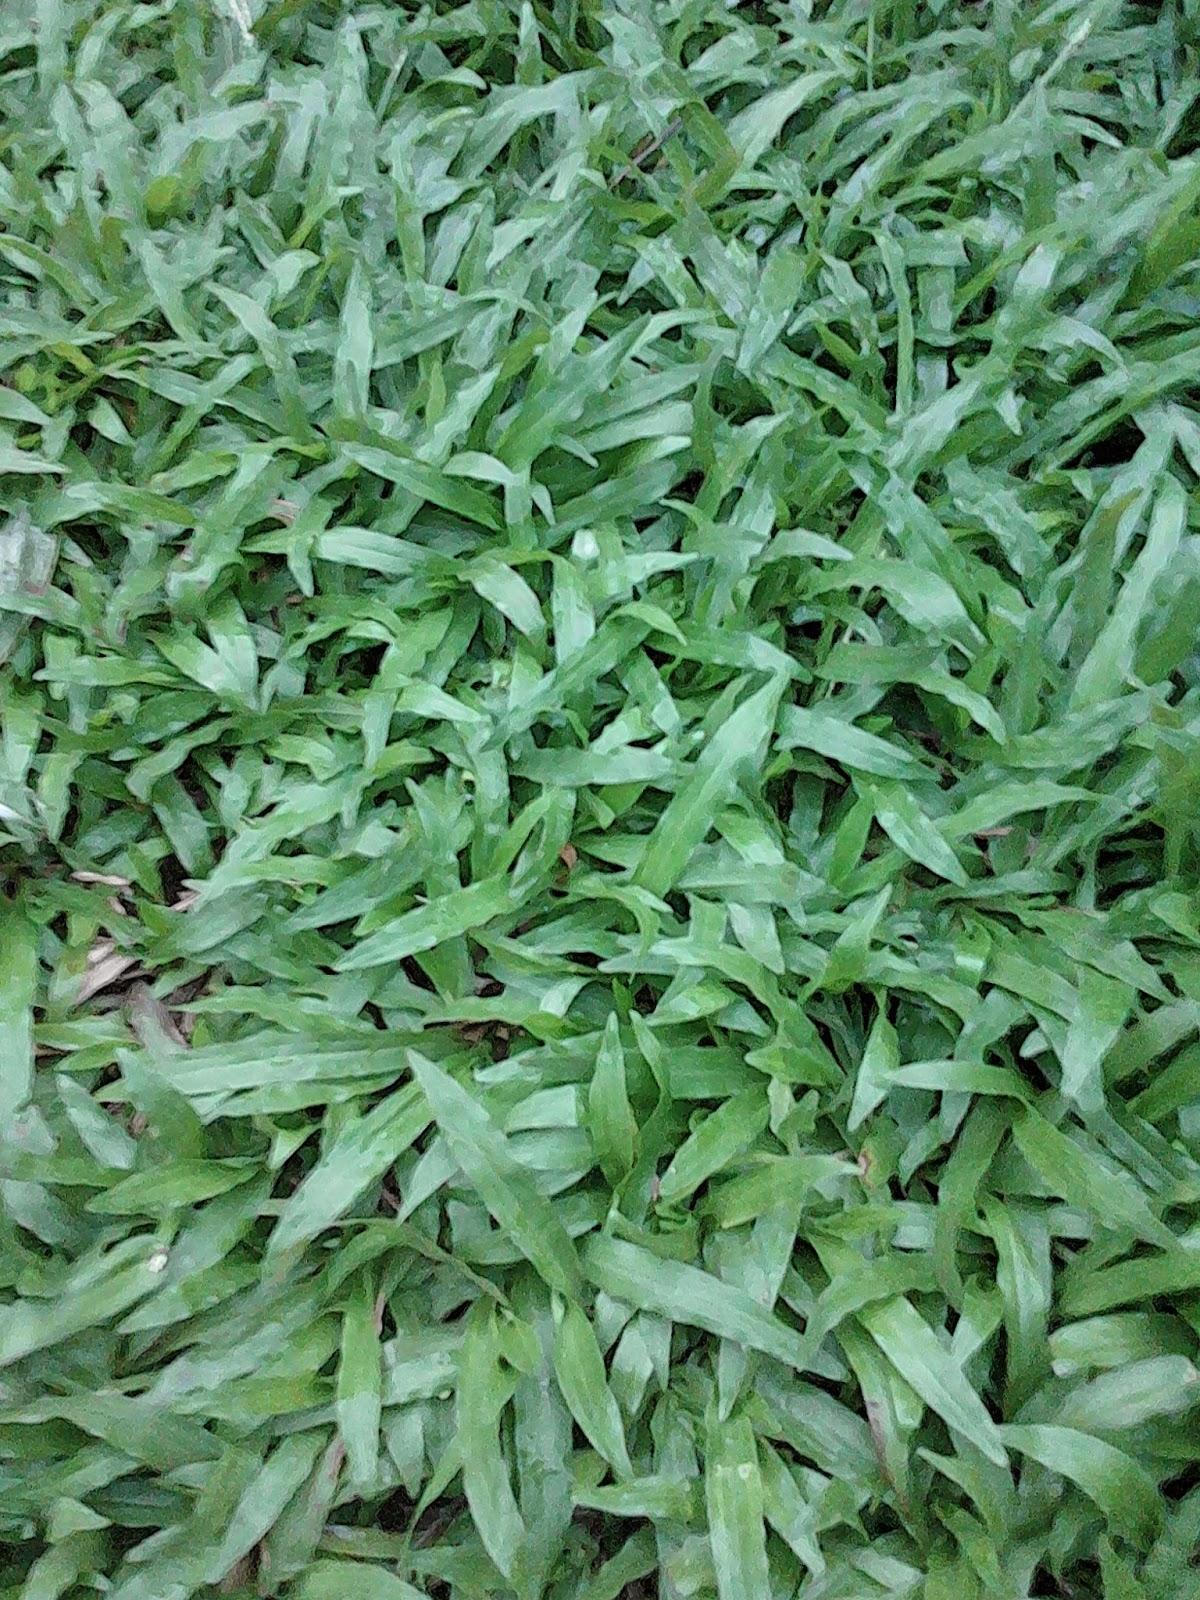 Jual rumput gajah | jasa tanam rumput | manfaat rumput untuk menahan erosi | aneka rumput